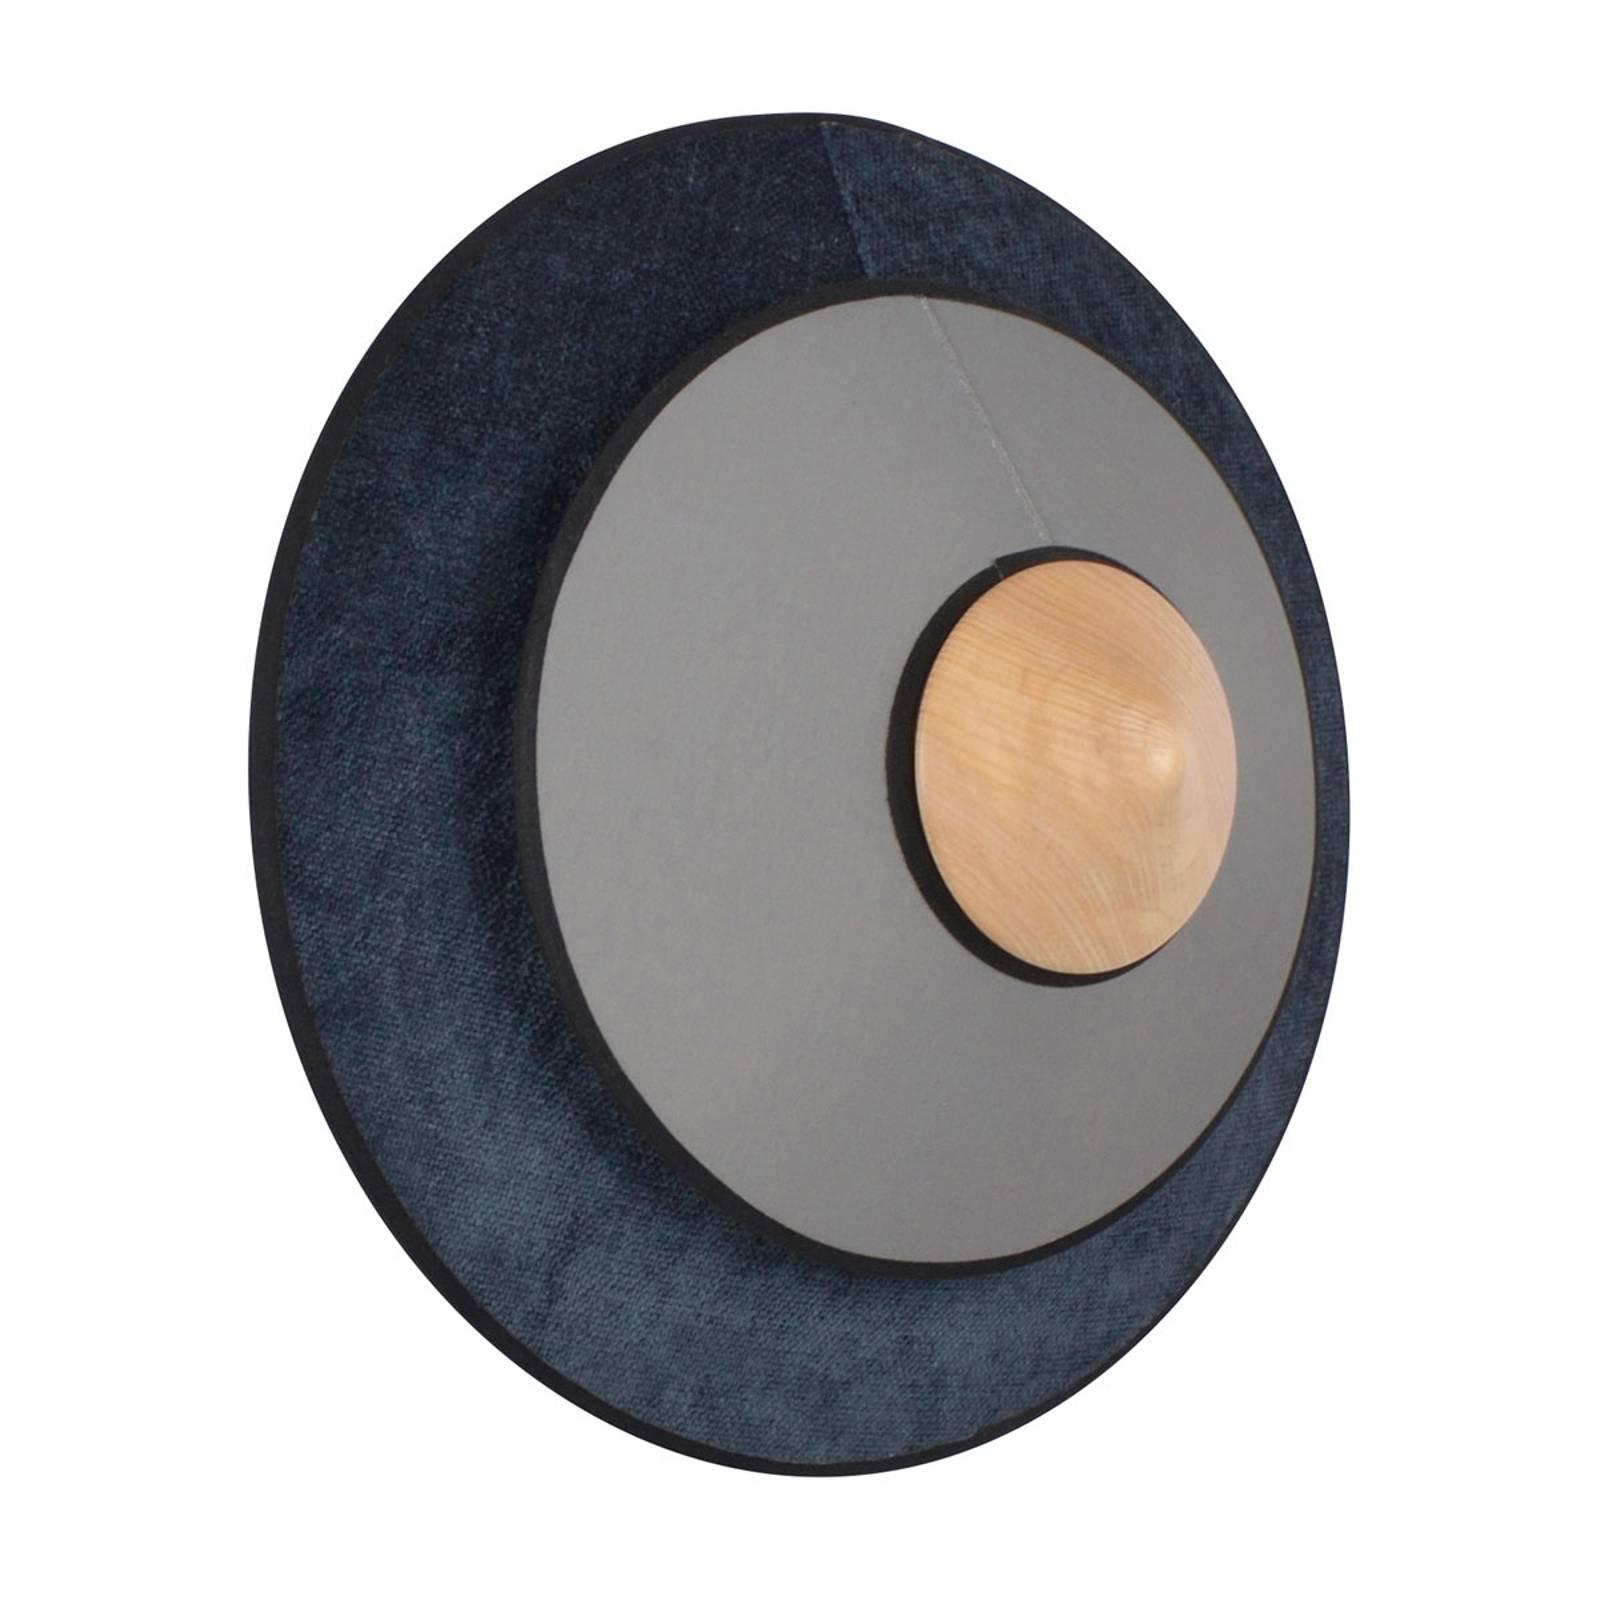 Forestier Cymbal S LED-vegglampe, midnatt